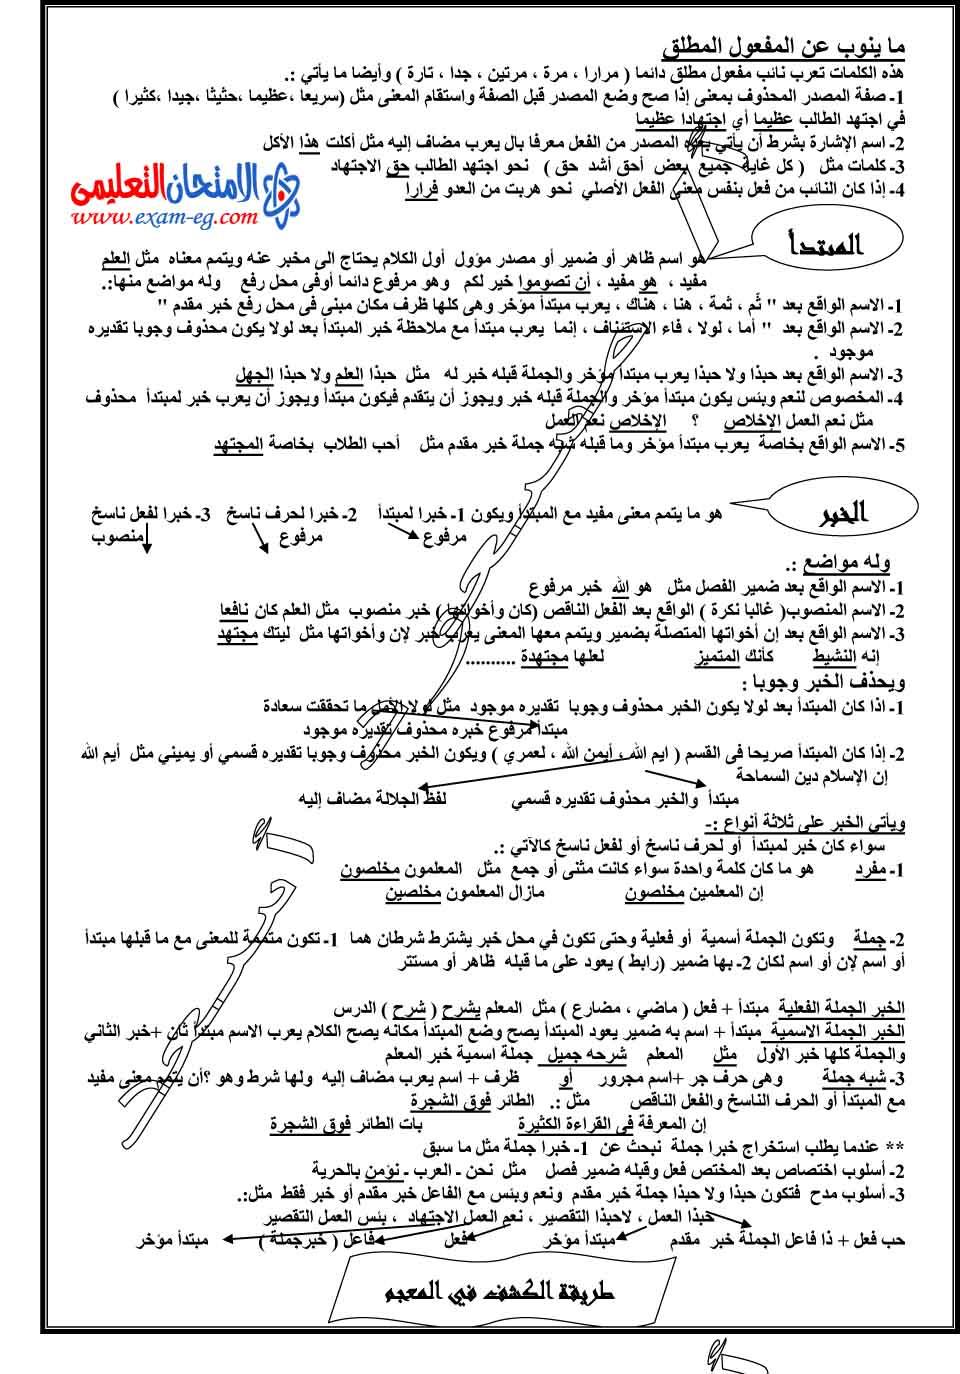 exam-eg.com_1453827904452.jpg